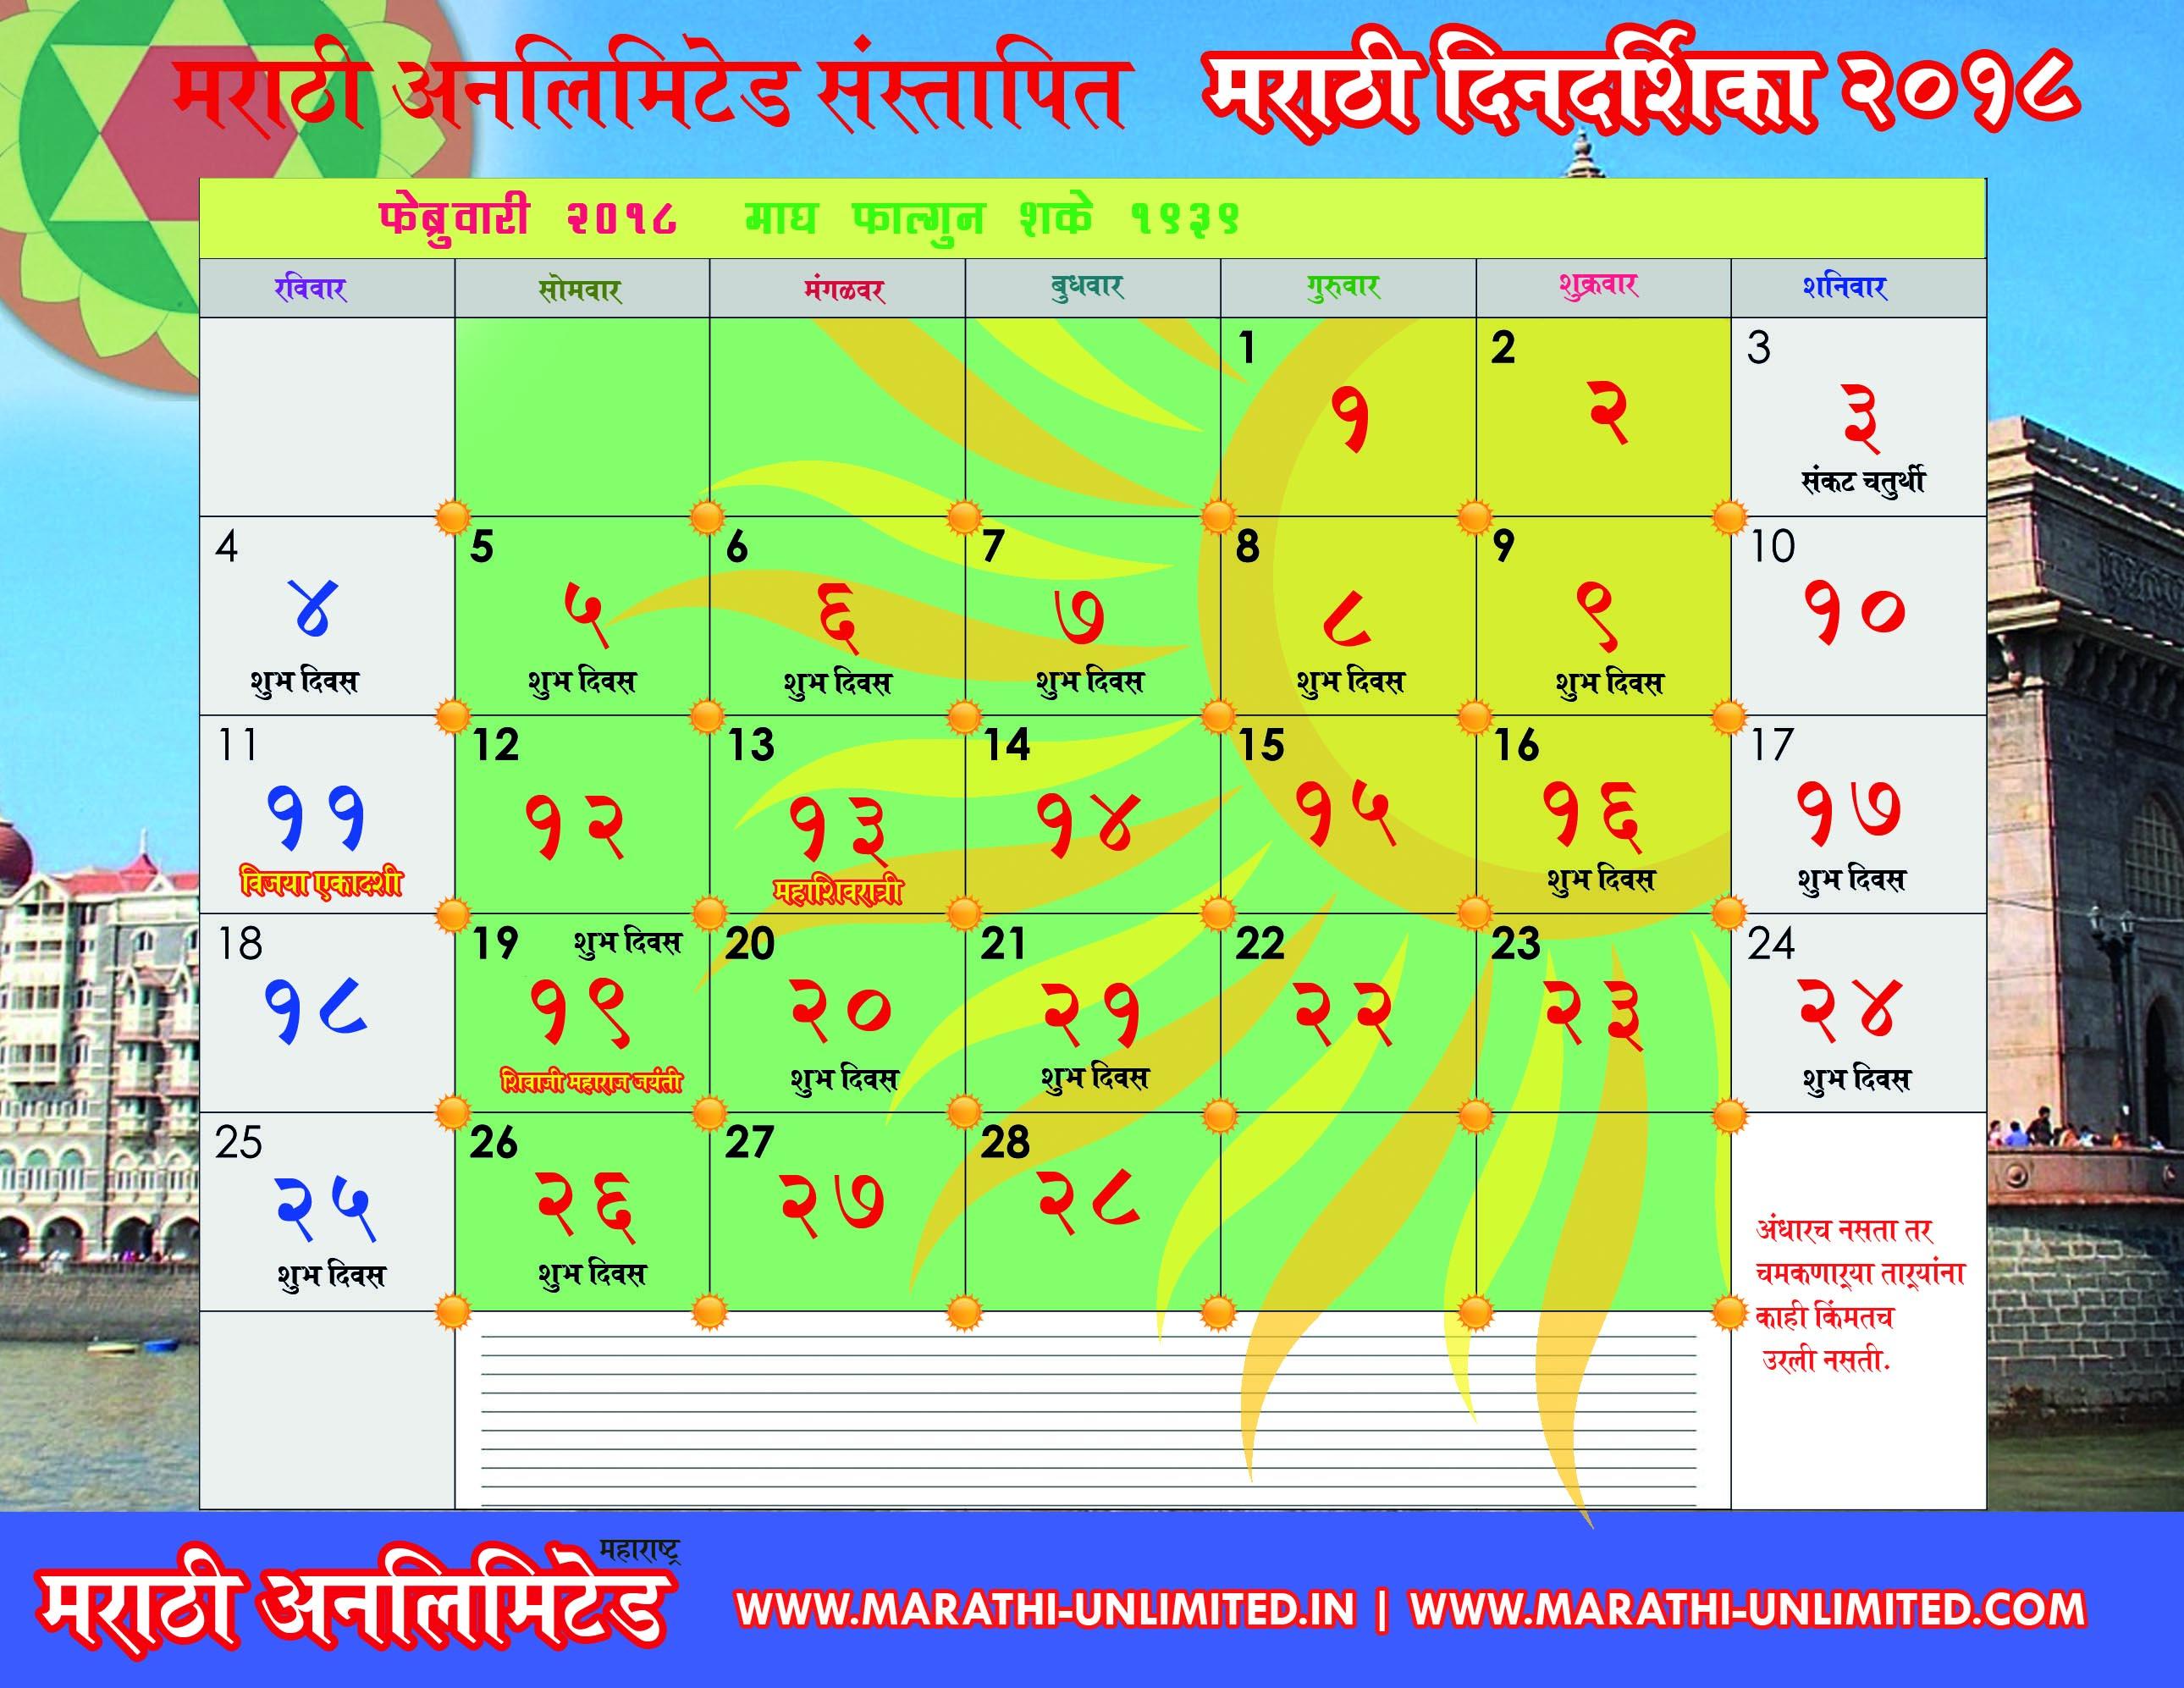 February 2018 Marathi Monthly Calendar pdf free download